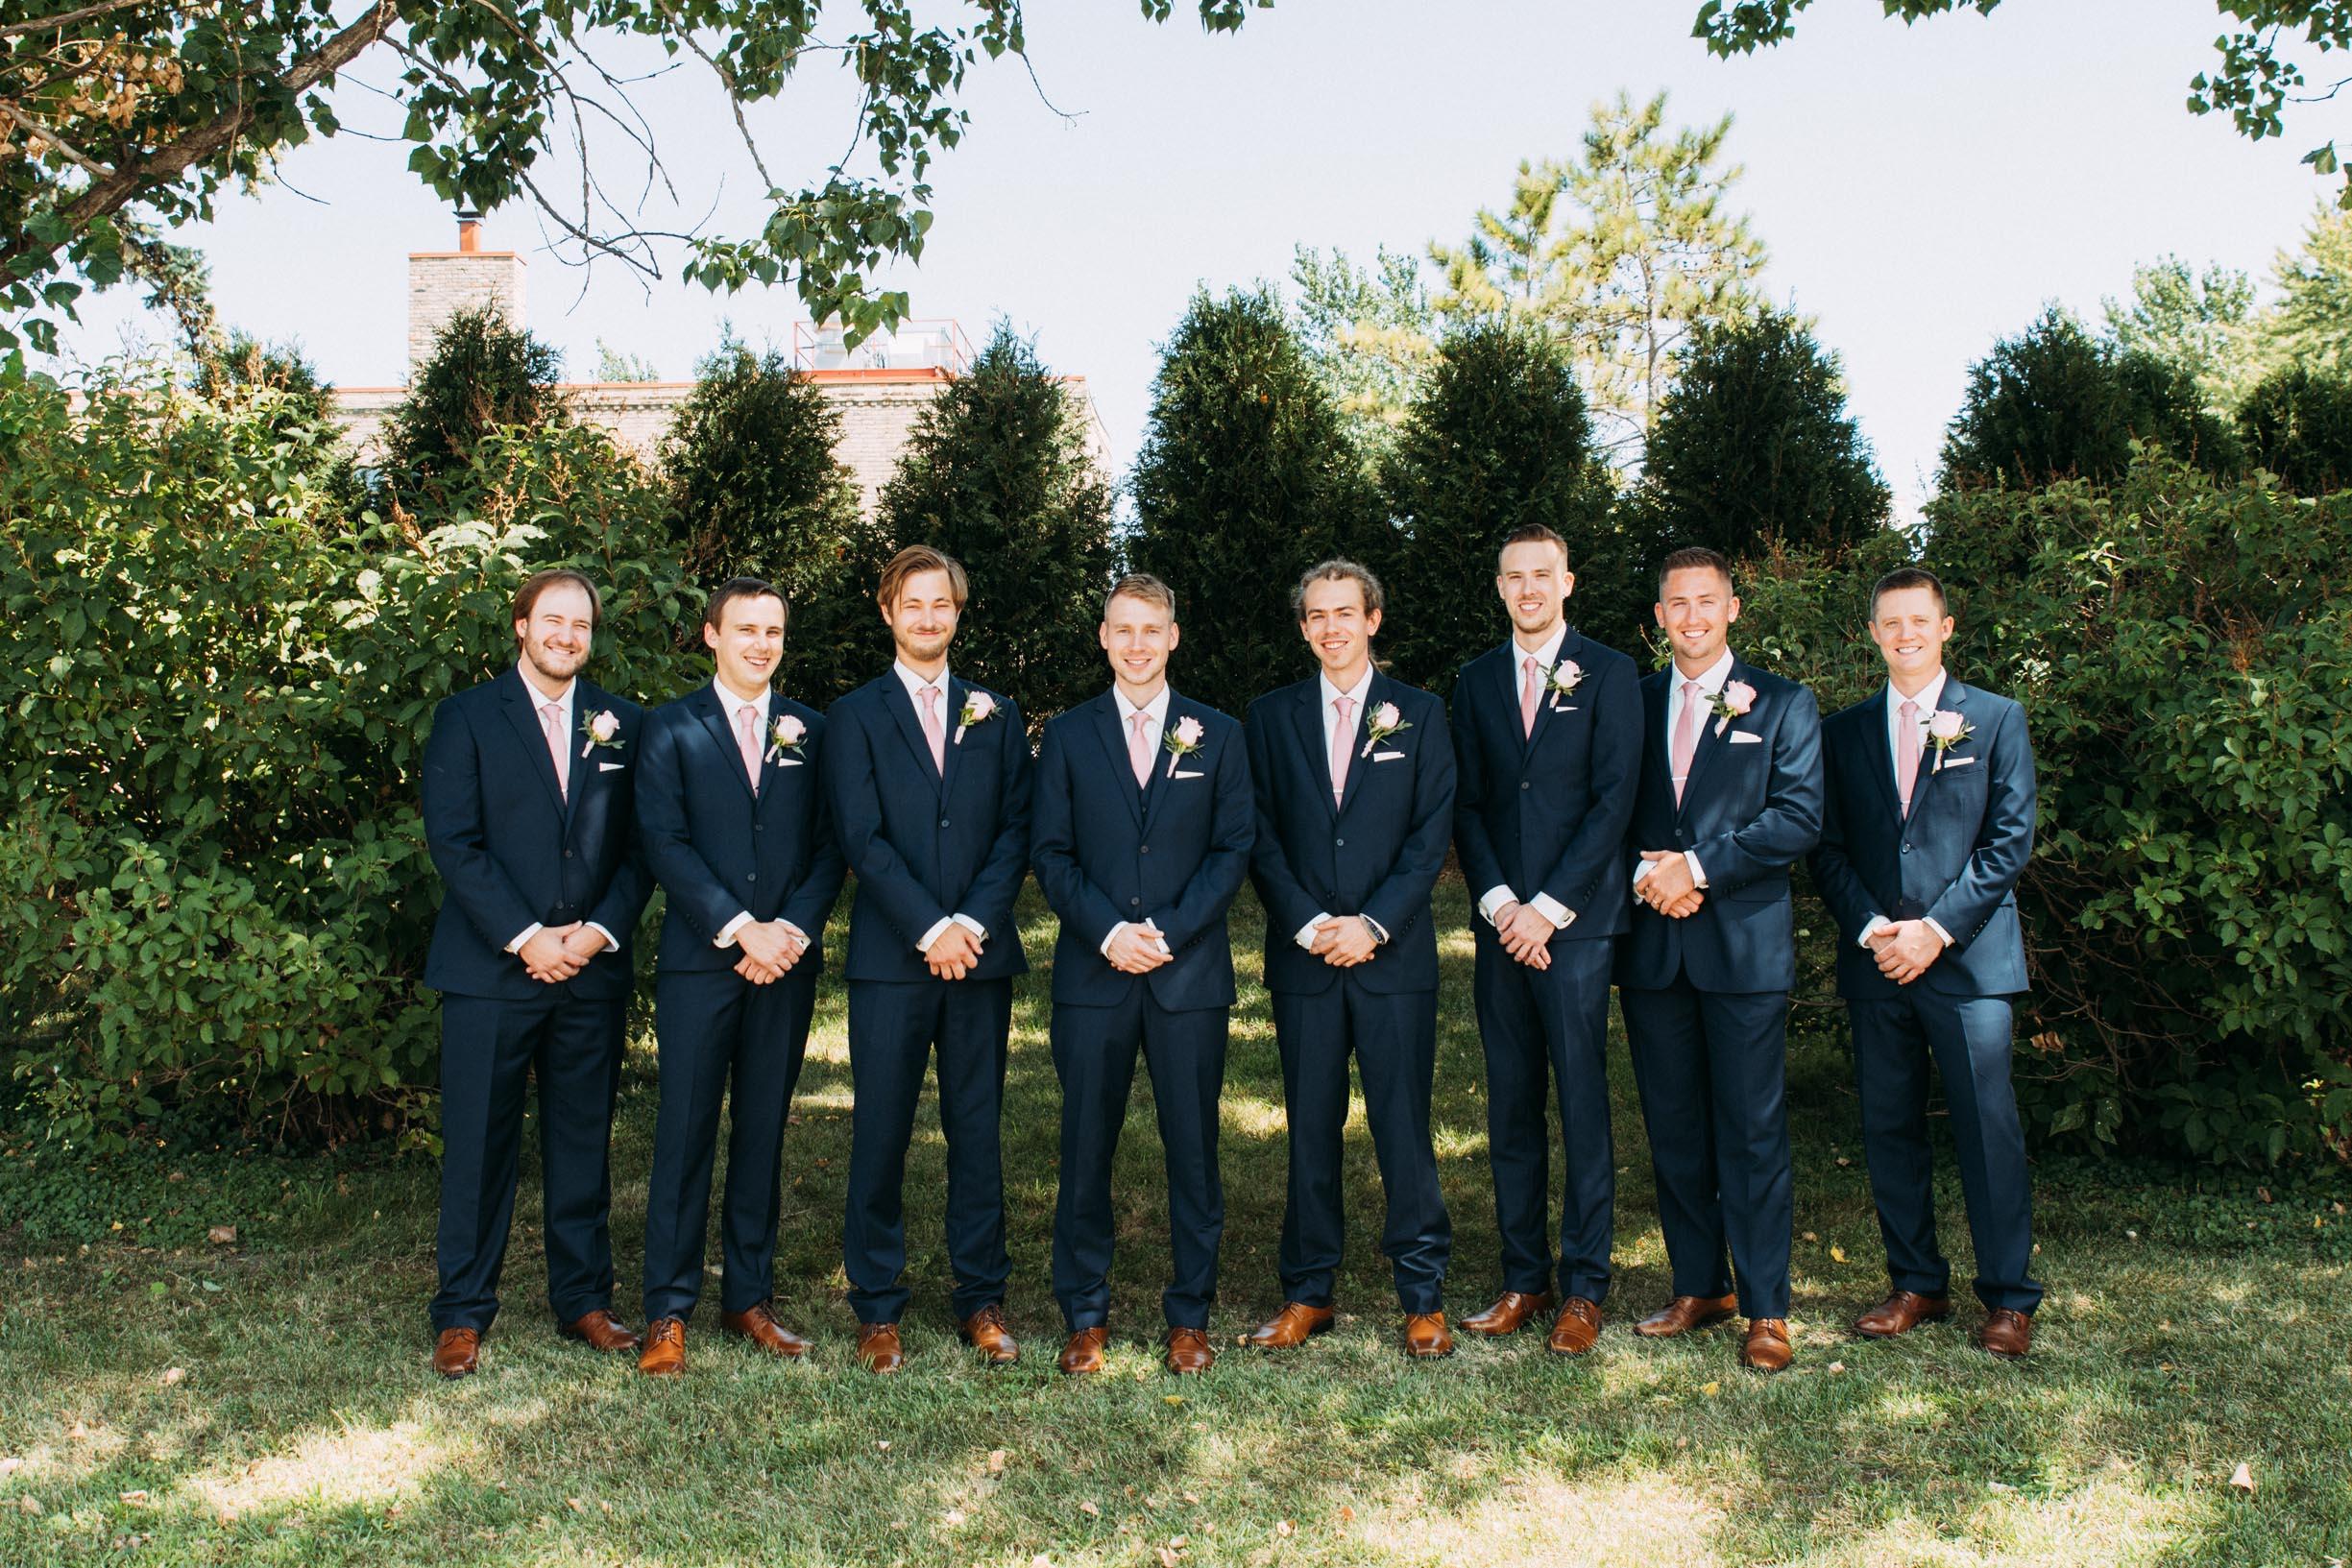 28-WeddingsattheBroz_Minnesota_WeddingBlog_WeddingParty.jpg